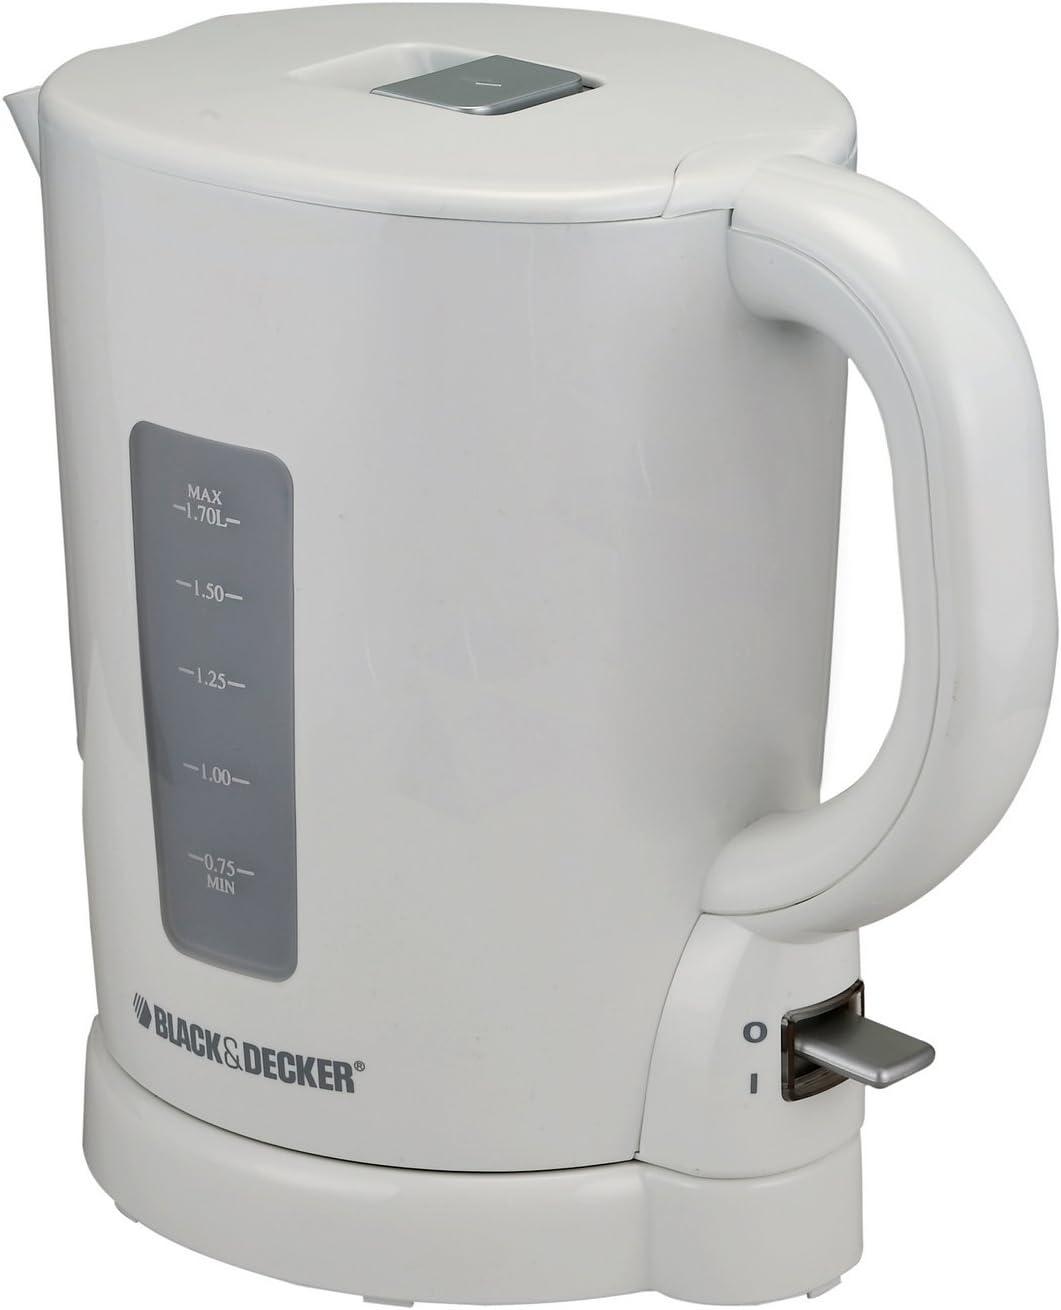 Black and Decker JC250 220 to 240-volt Electric Tea Kettle, 1.7-Liter